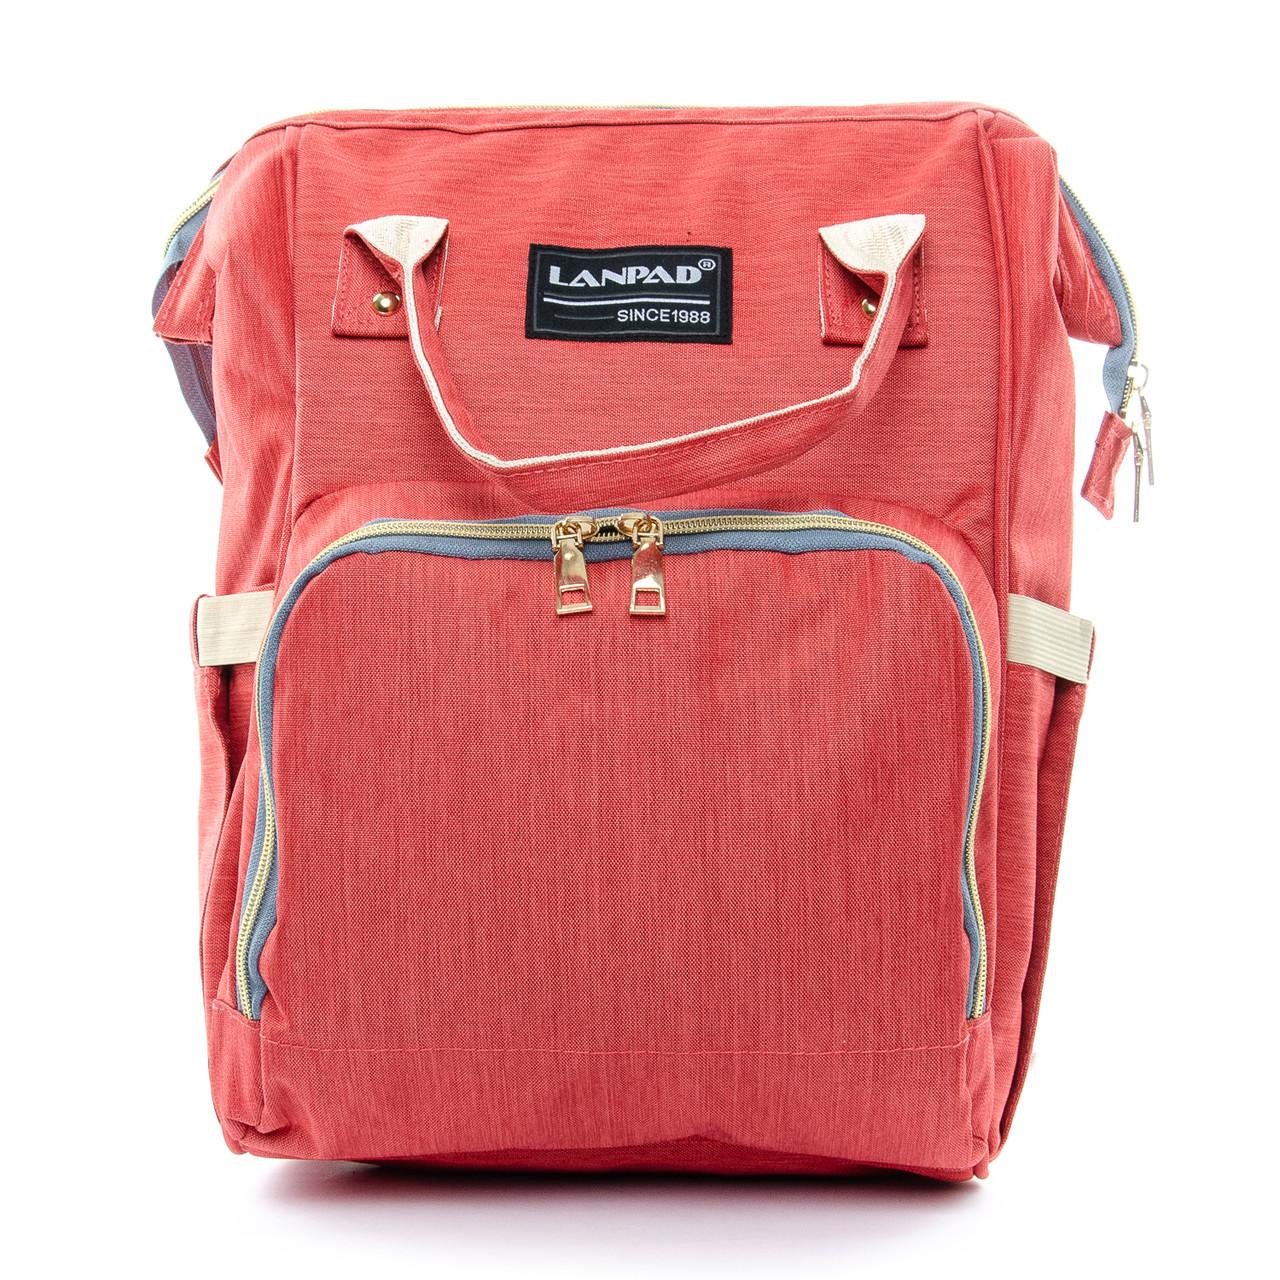 Сумка-рюкзак/органайзер для мамы Lanpad опт/розница